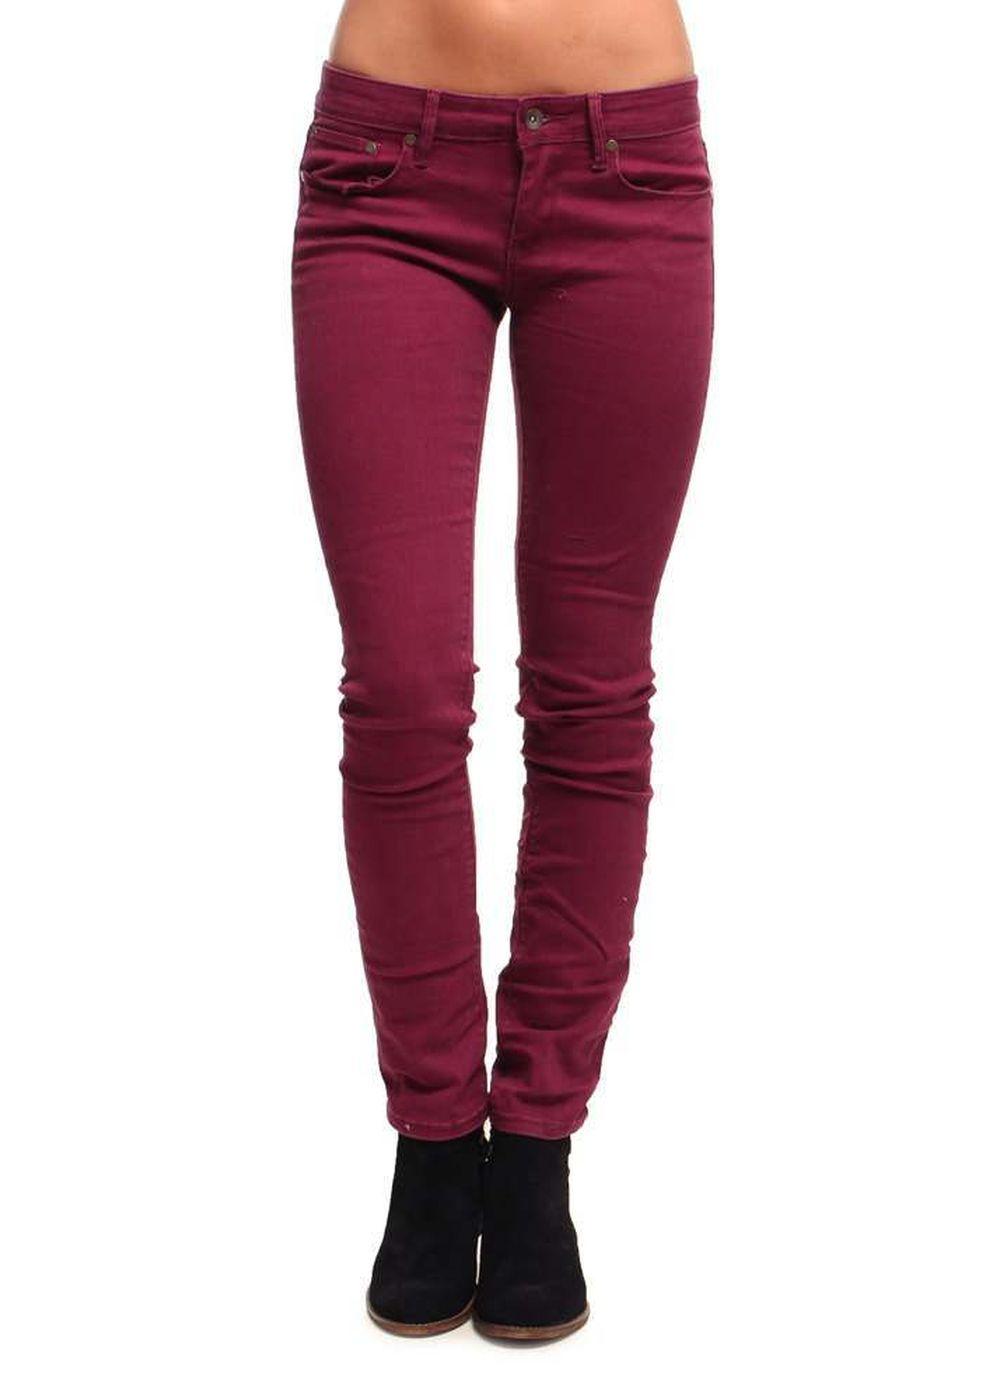 roxy-suntrippers-colours-jeans-grape-wine